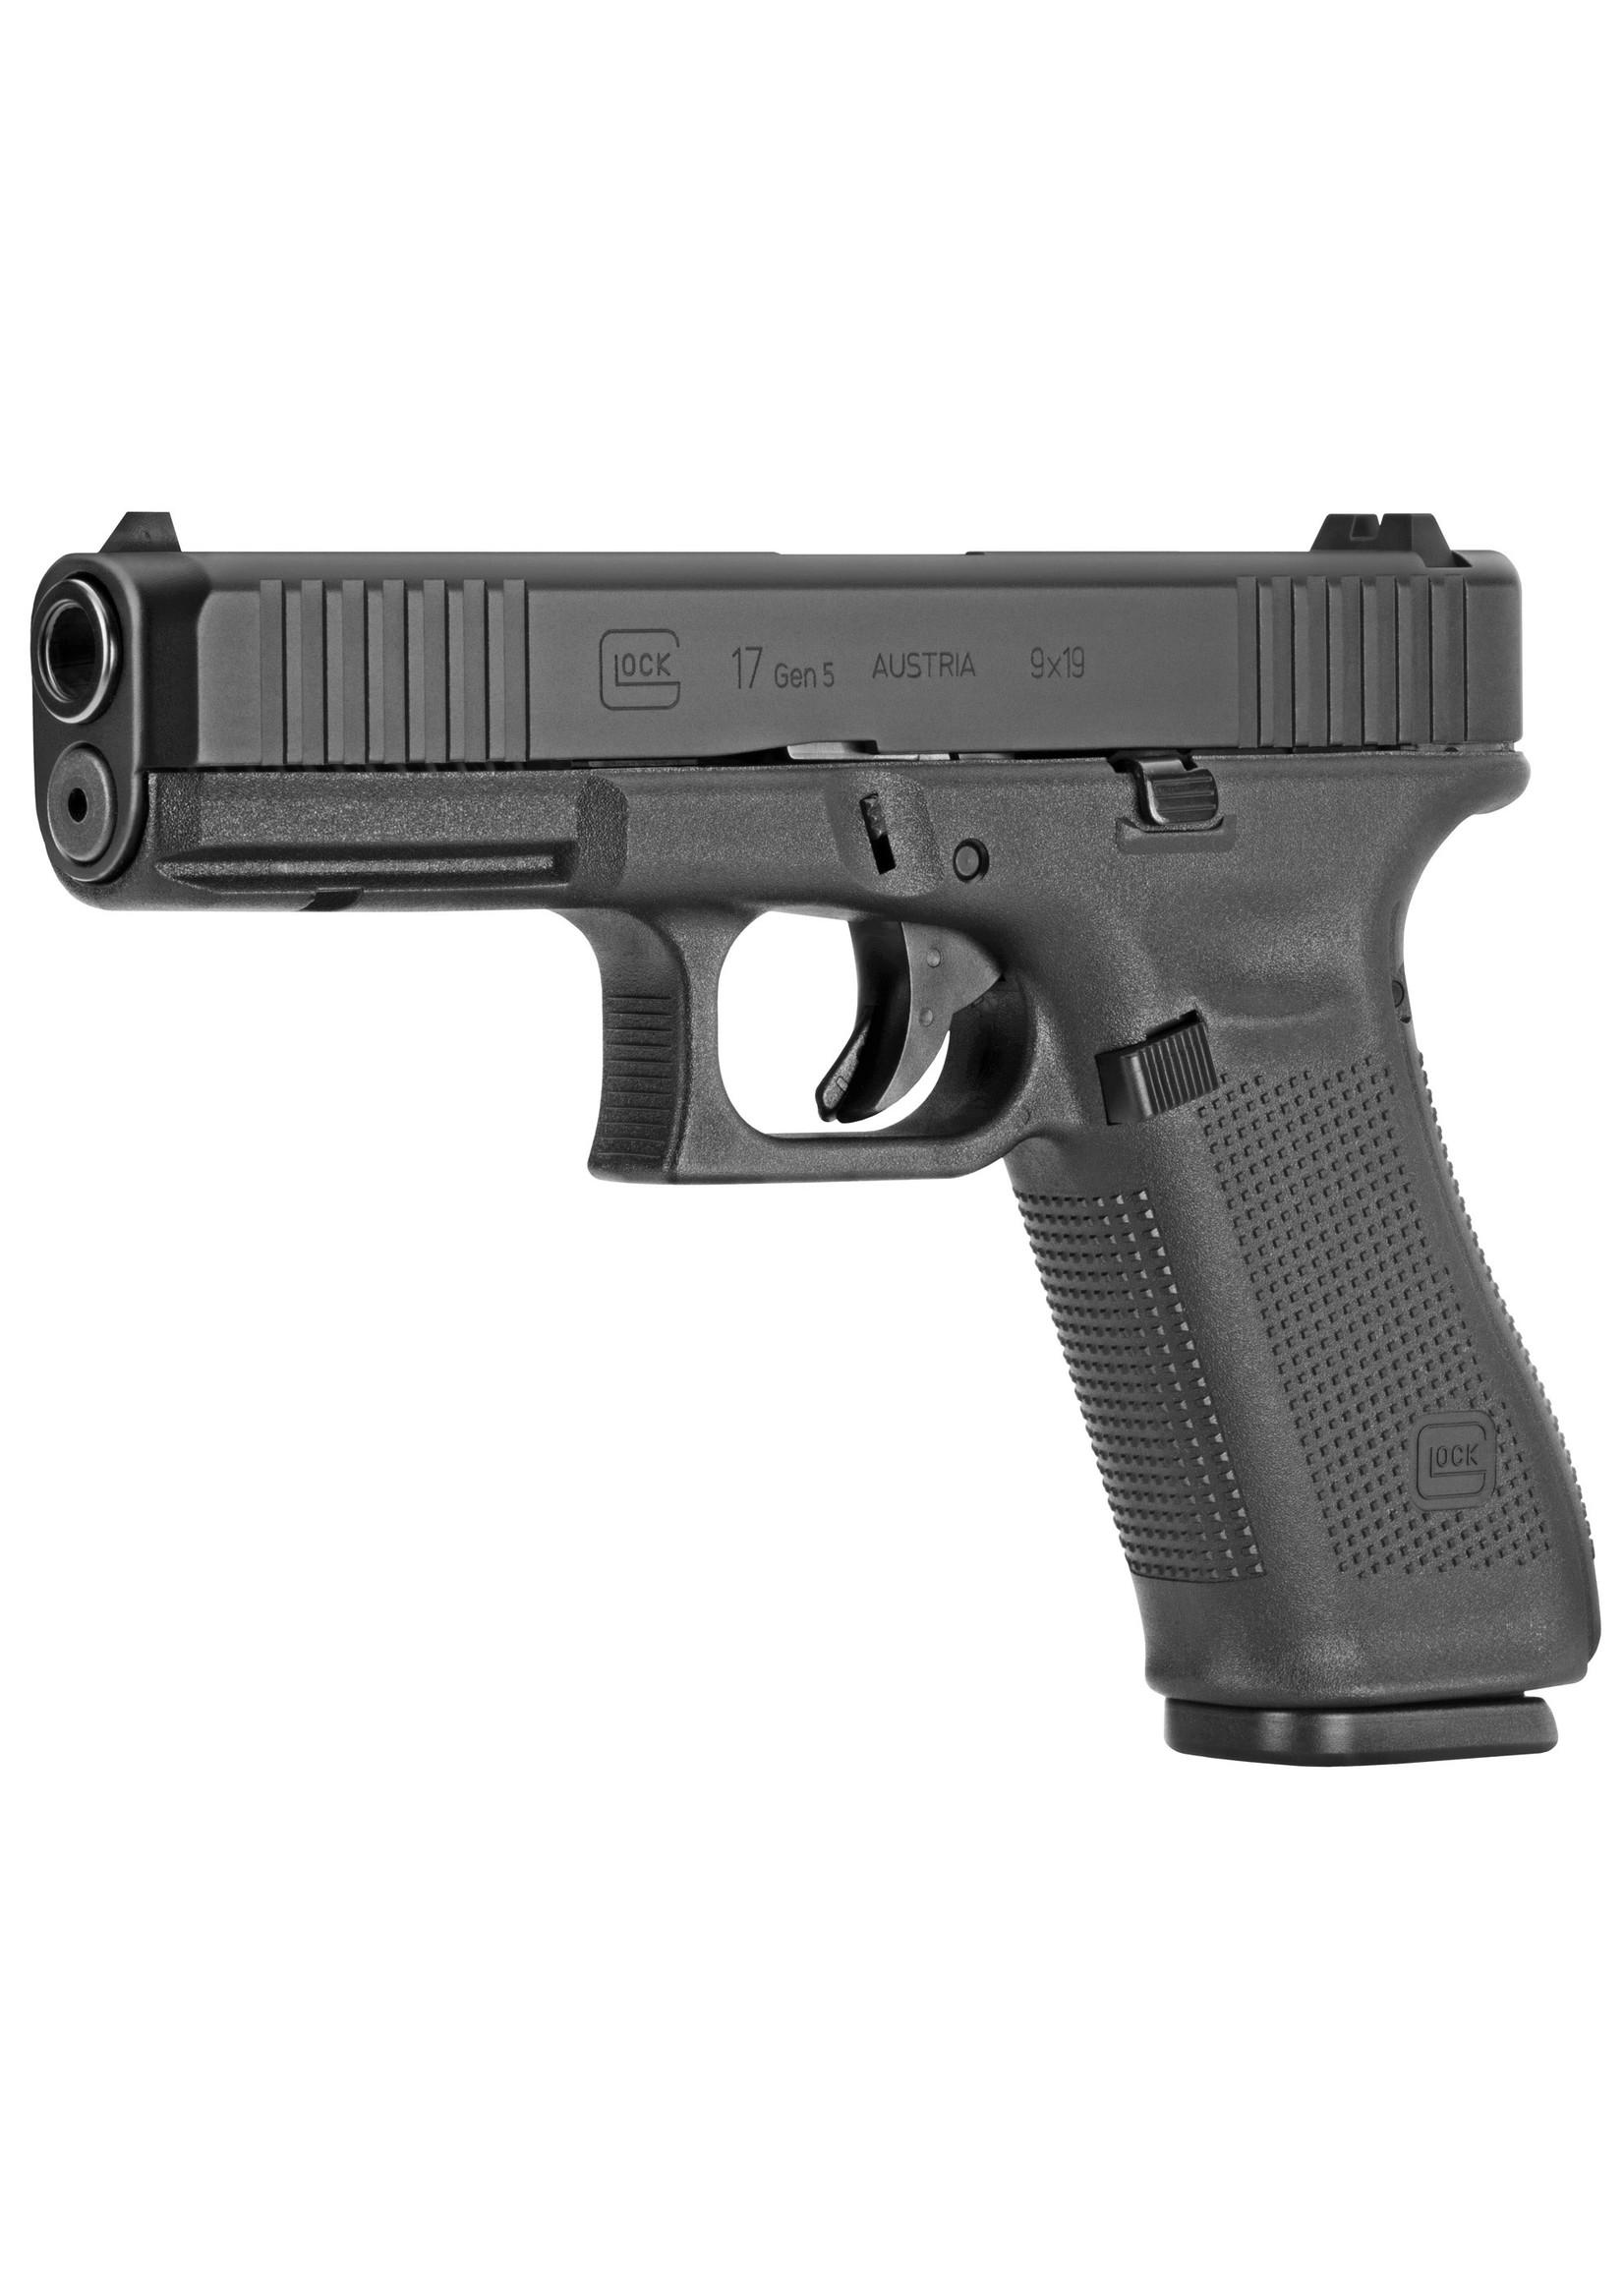 "Glock Glock 17 G5, 9MM, 4.49"" Marksman Barrel, Polymer Frame, Matte Finish, Fixed Sights, 17Rd, 3 Magazines"